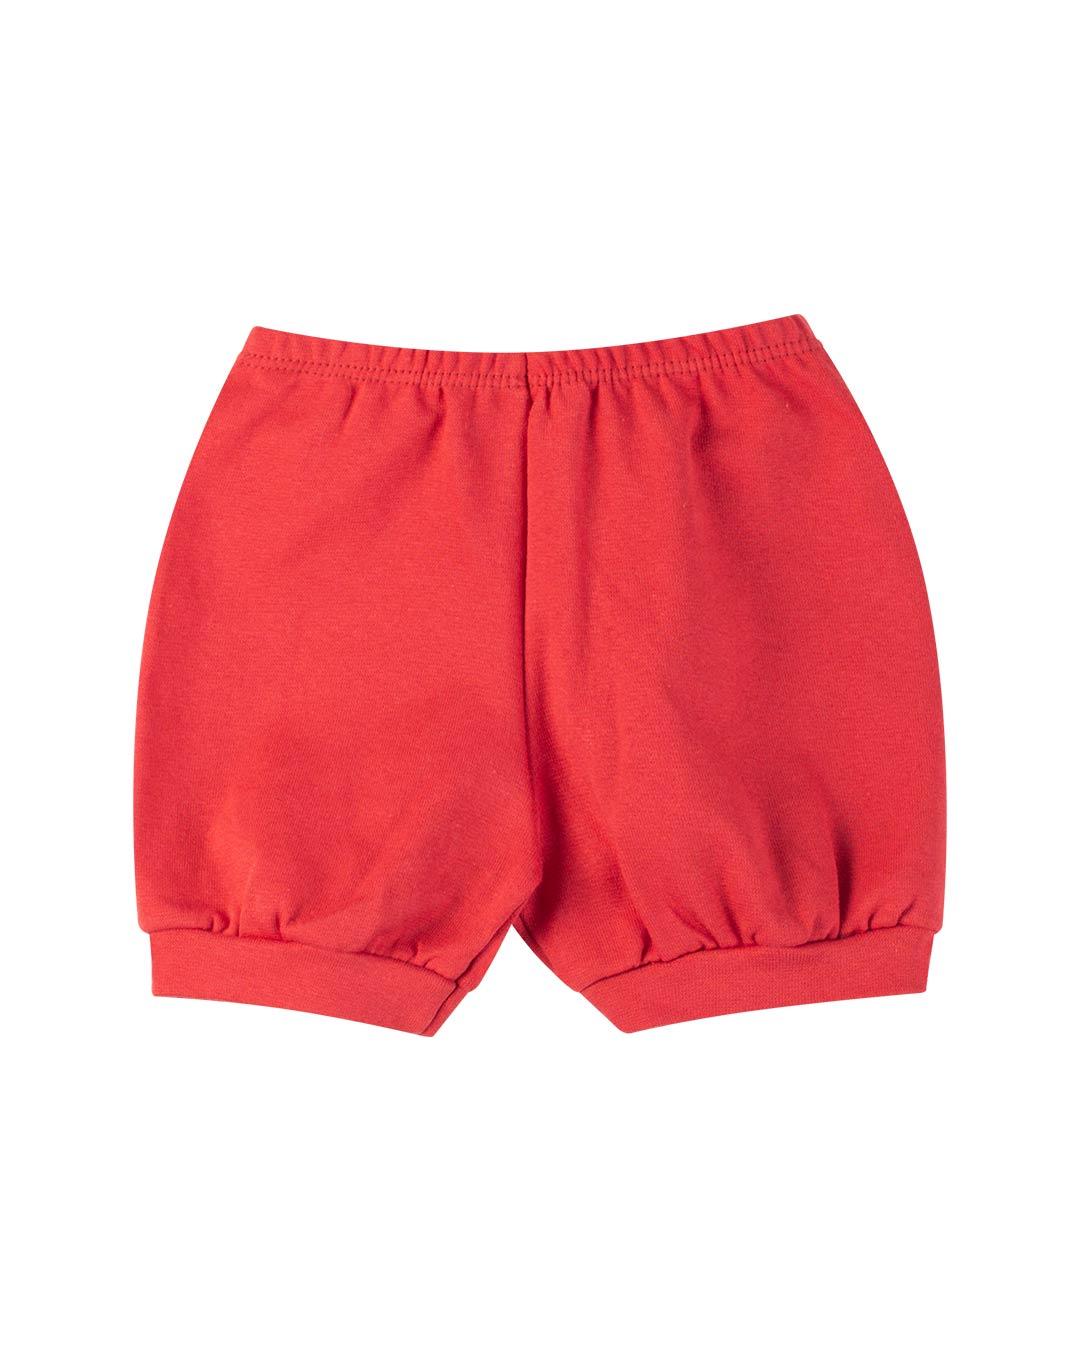 Kit Body 3 Peças com Bermuda Sorvetinho Vermelho - Sorriso Kids